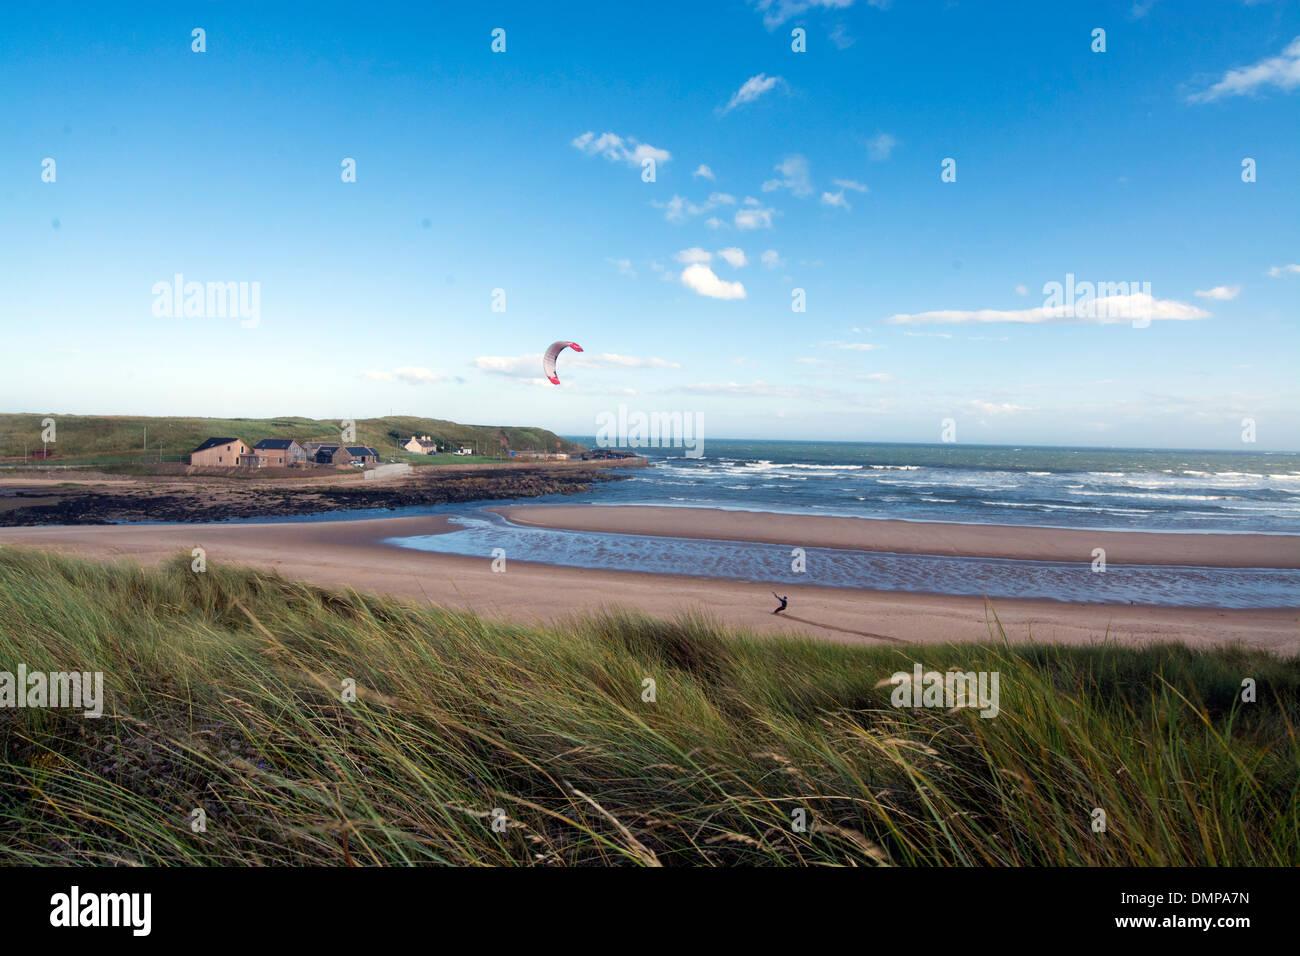 ruden bay  aberdeen sand dunes power kiting - Stock Image